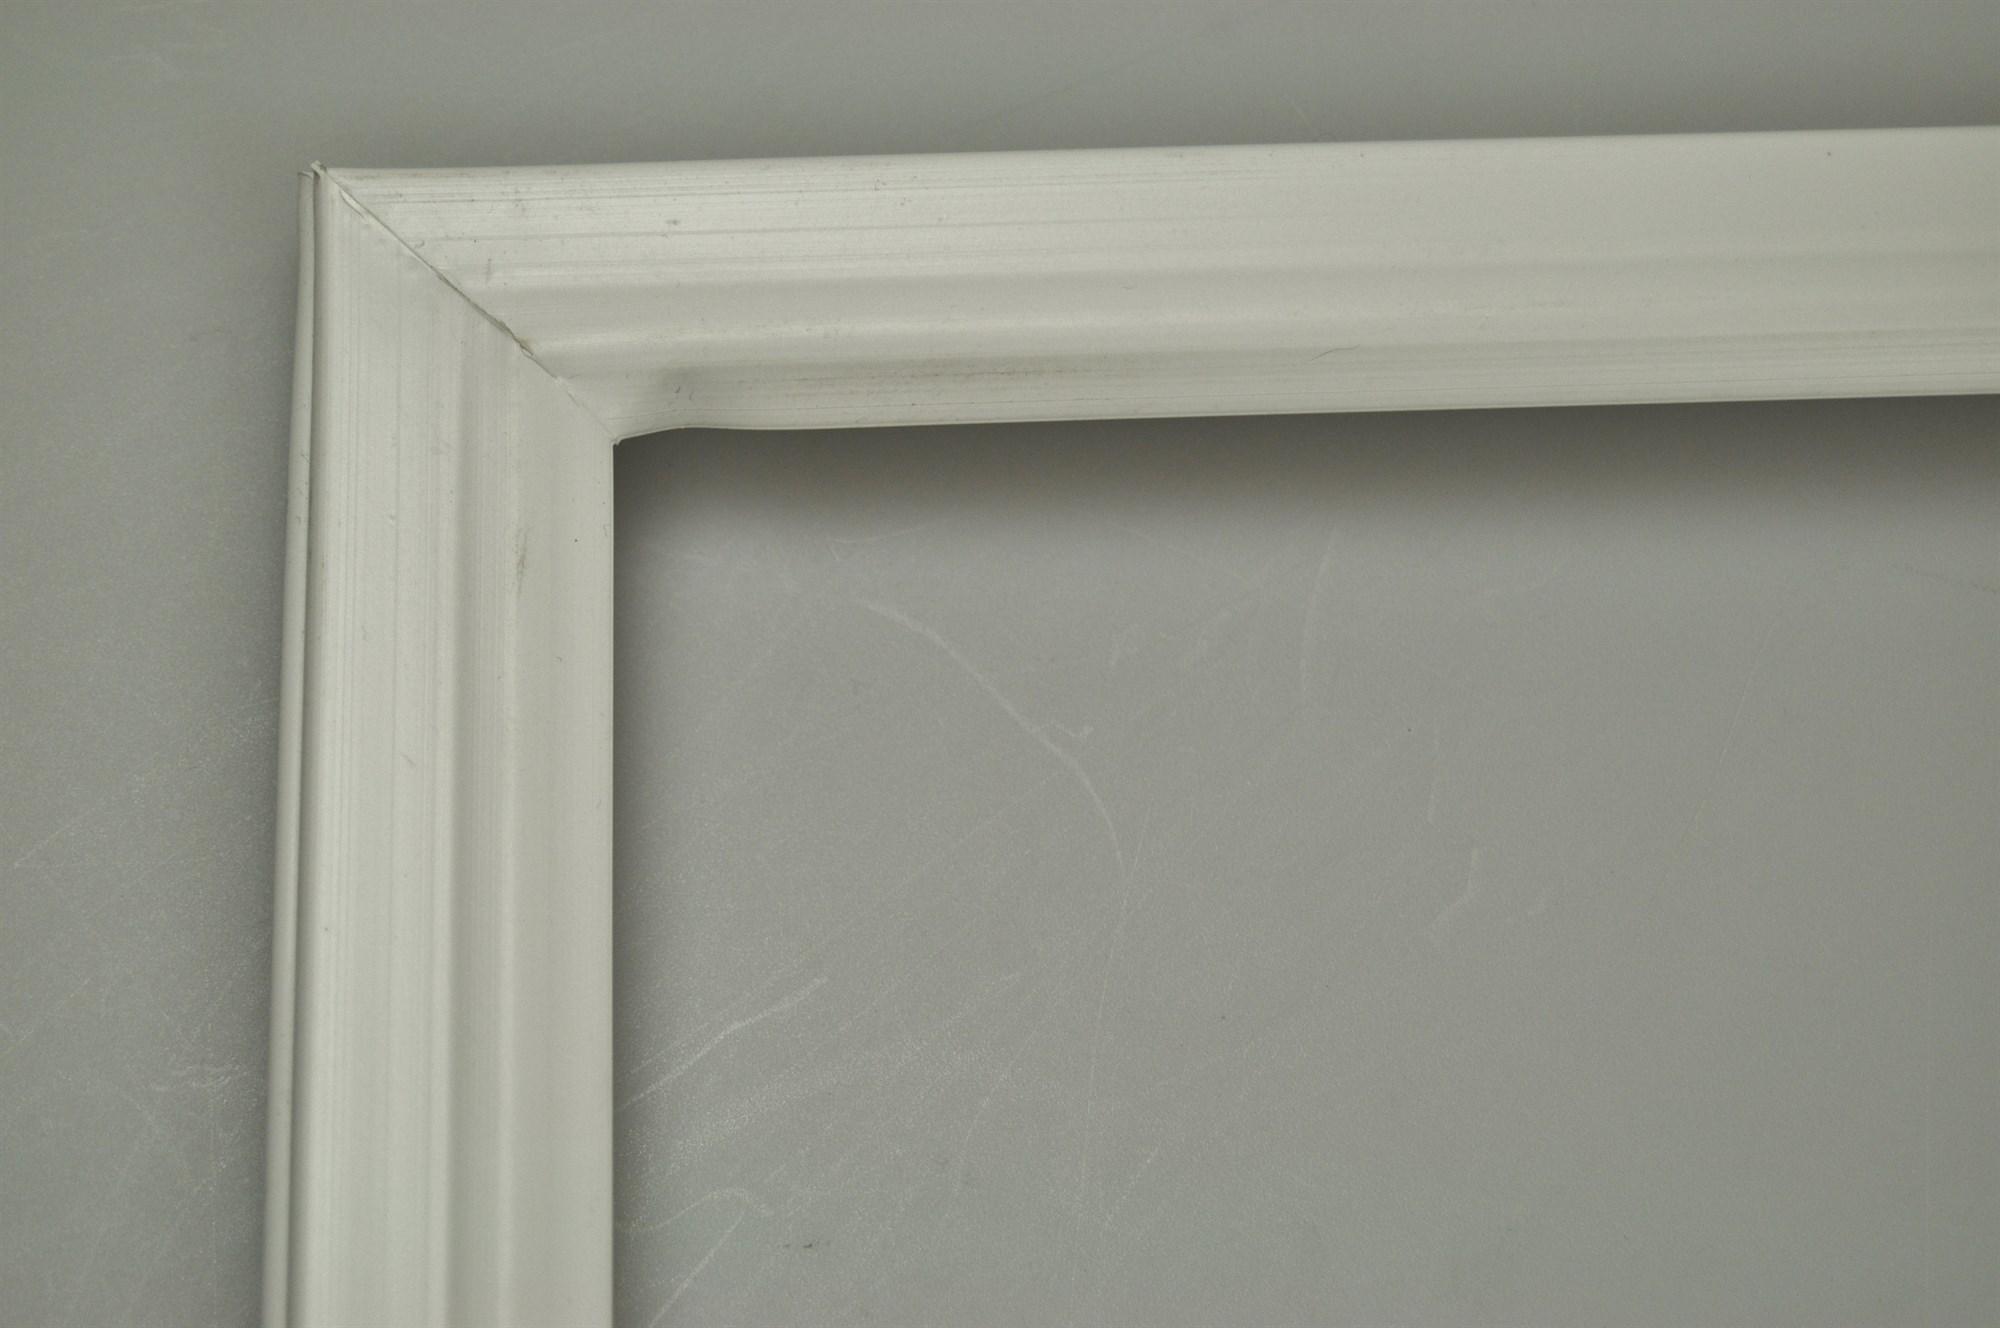 joint de r frig rateur whirlpool frigo cong lateur. Black Bedroom Furniture Sets. Home Design Ideas